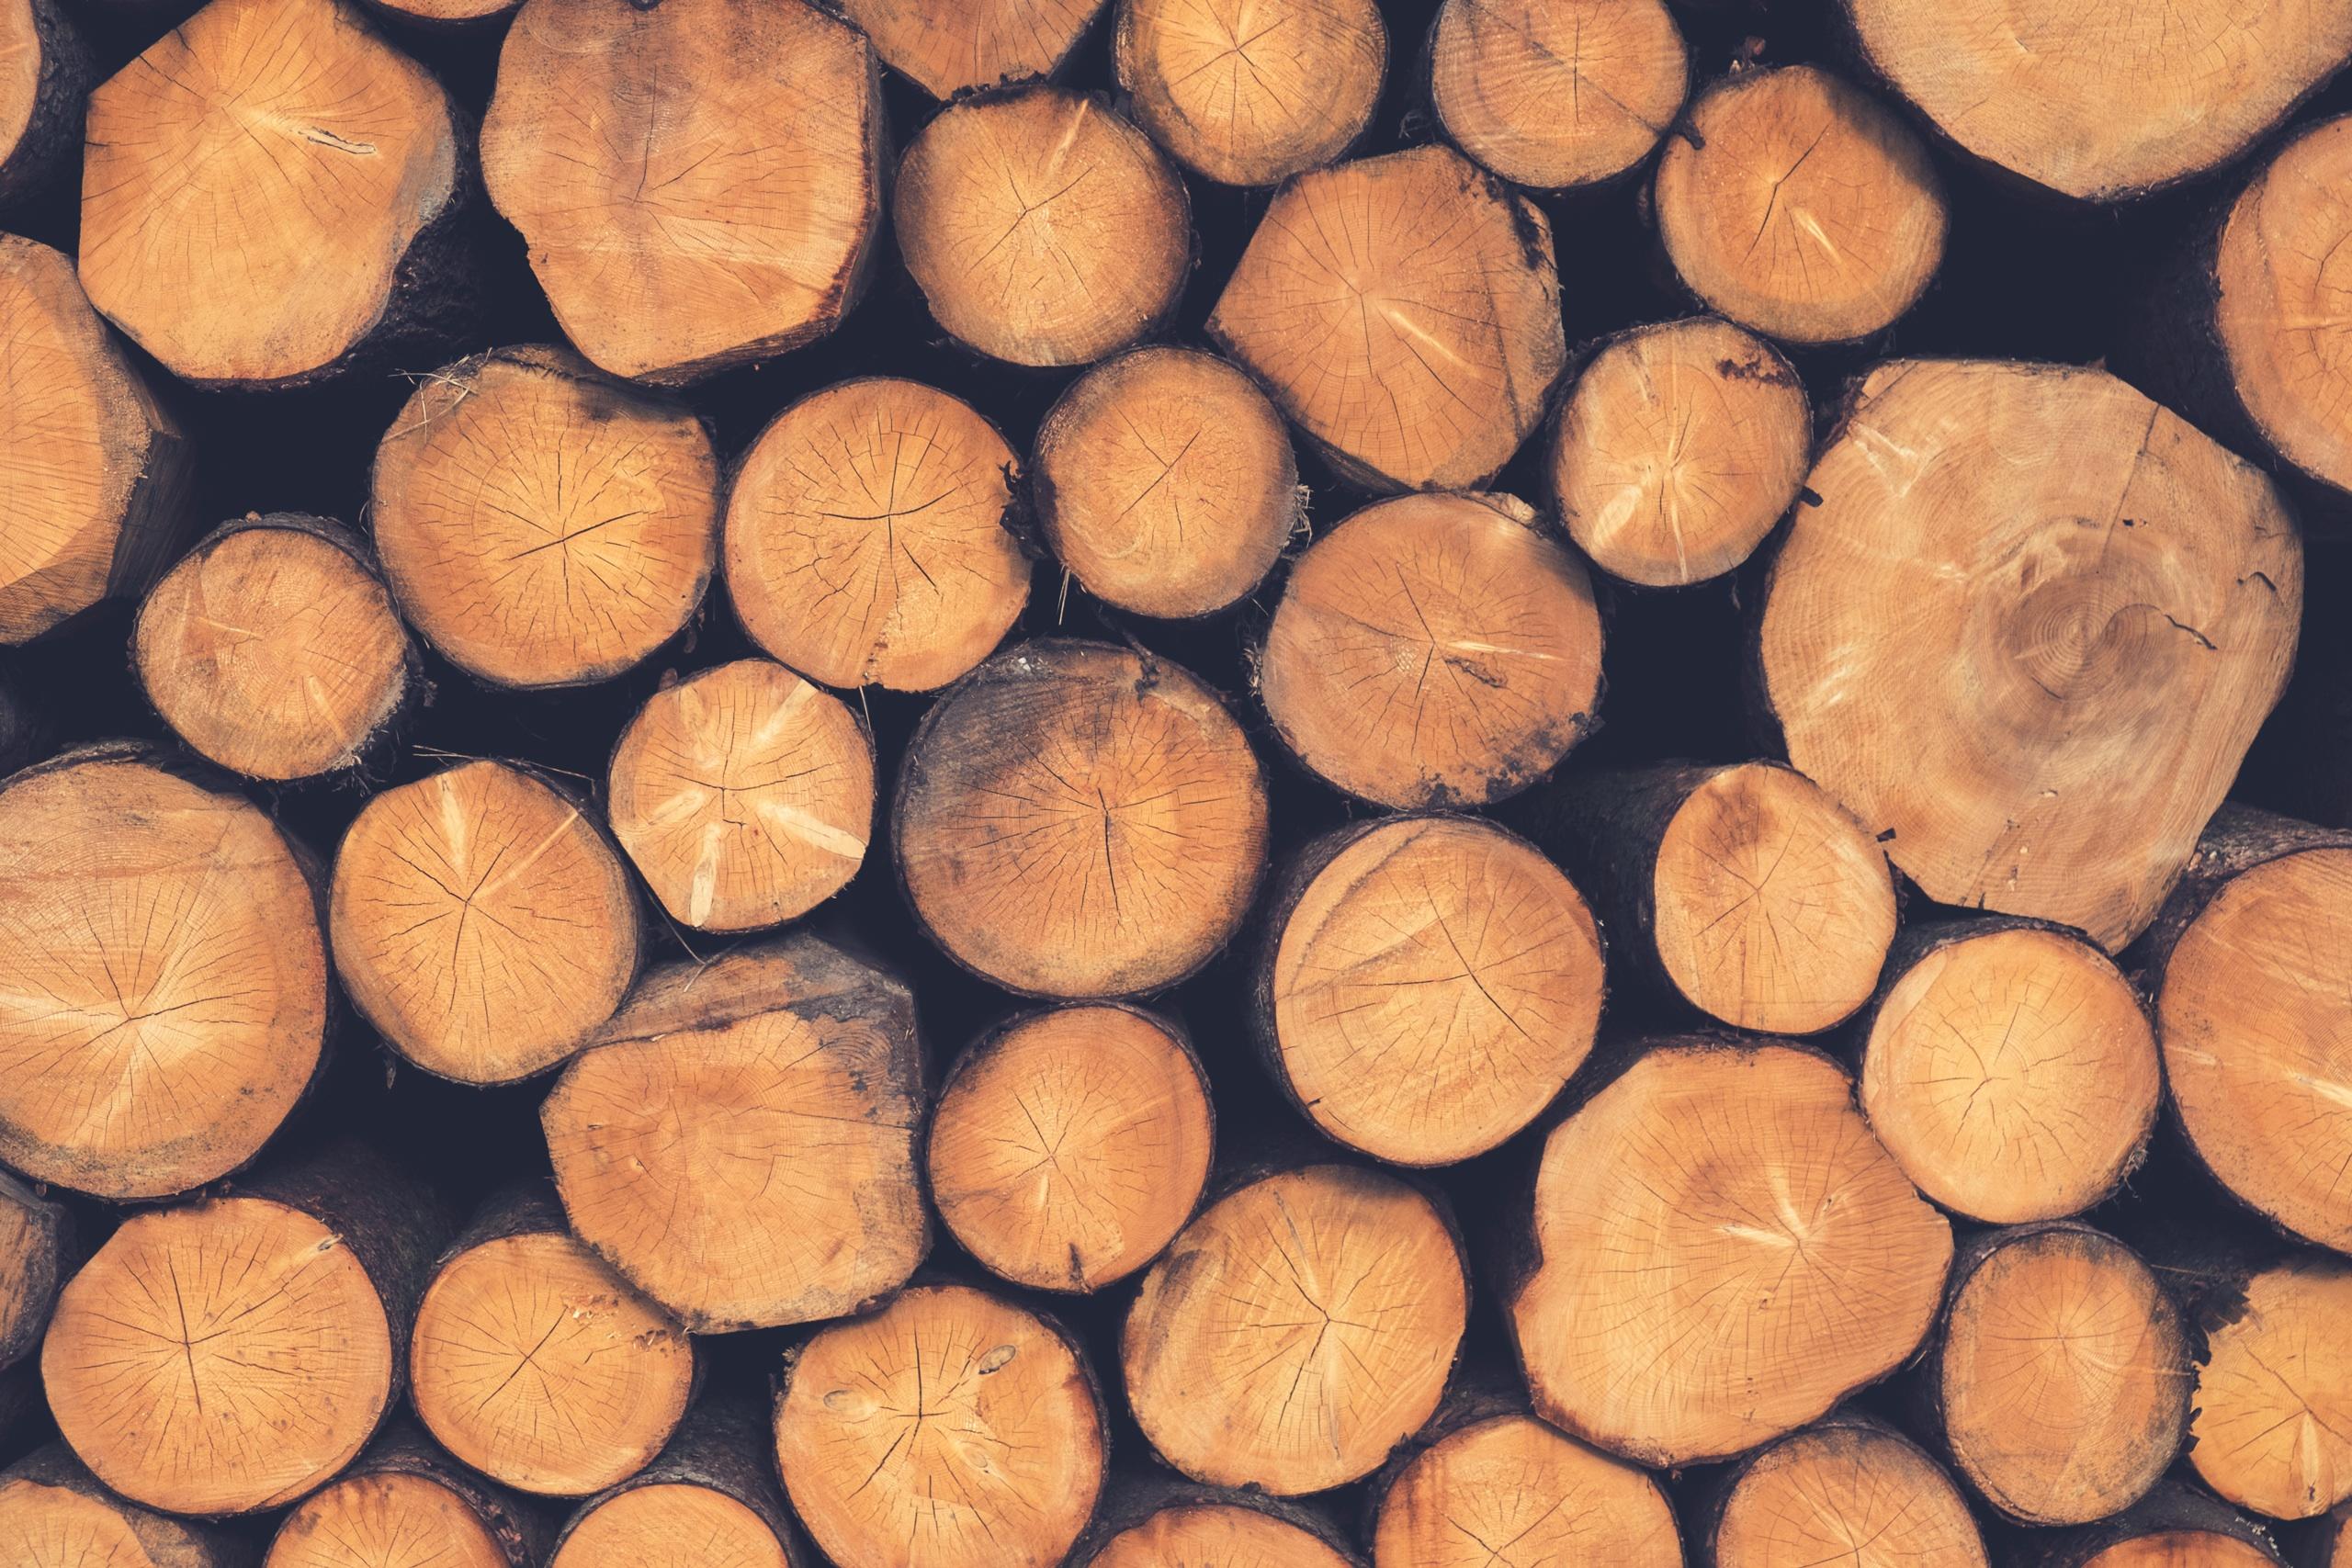 free images produce baking wood pile dessert coconut log pile